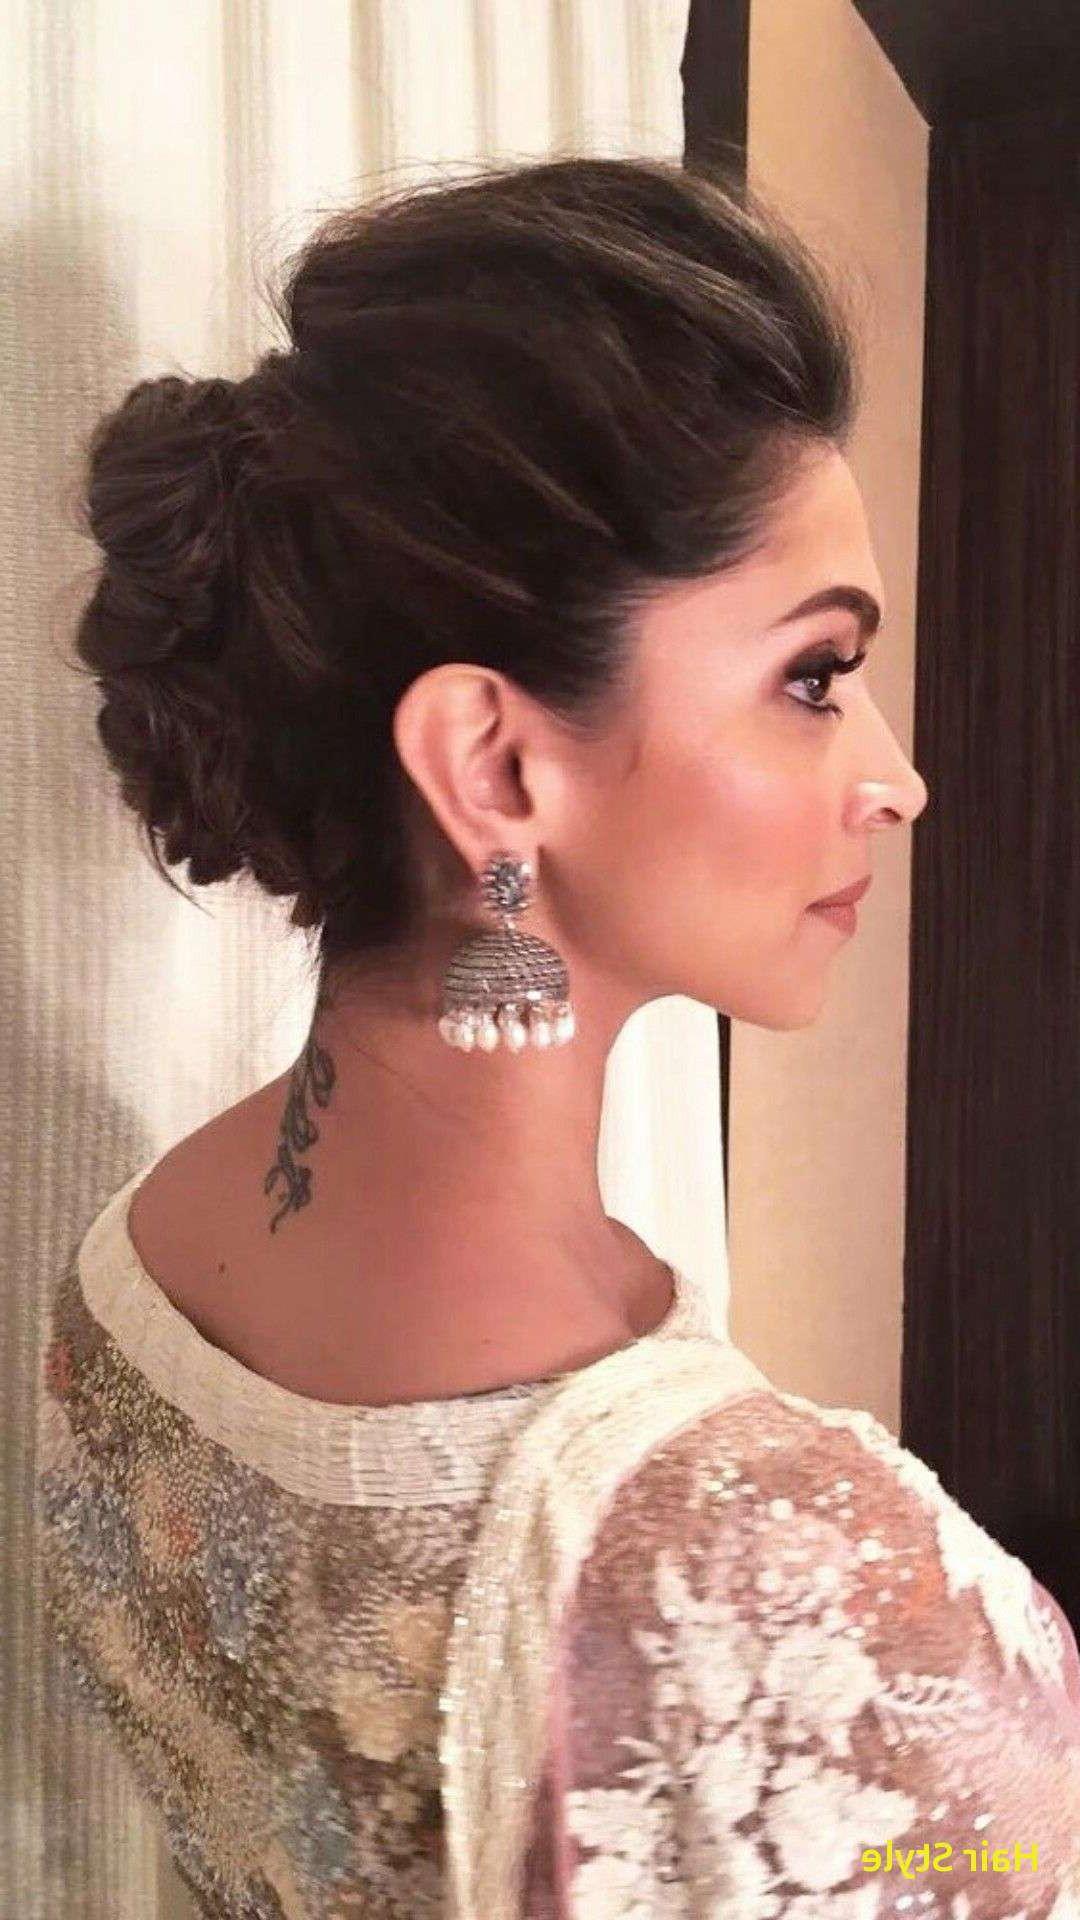 Indian Wedding Hairstyles For Long Hair Videos Best Of Elegant Regarding Short Hairstyles For Indian Wedding (View 21 of 25)